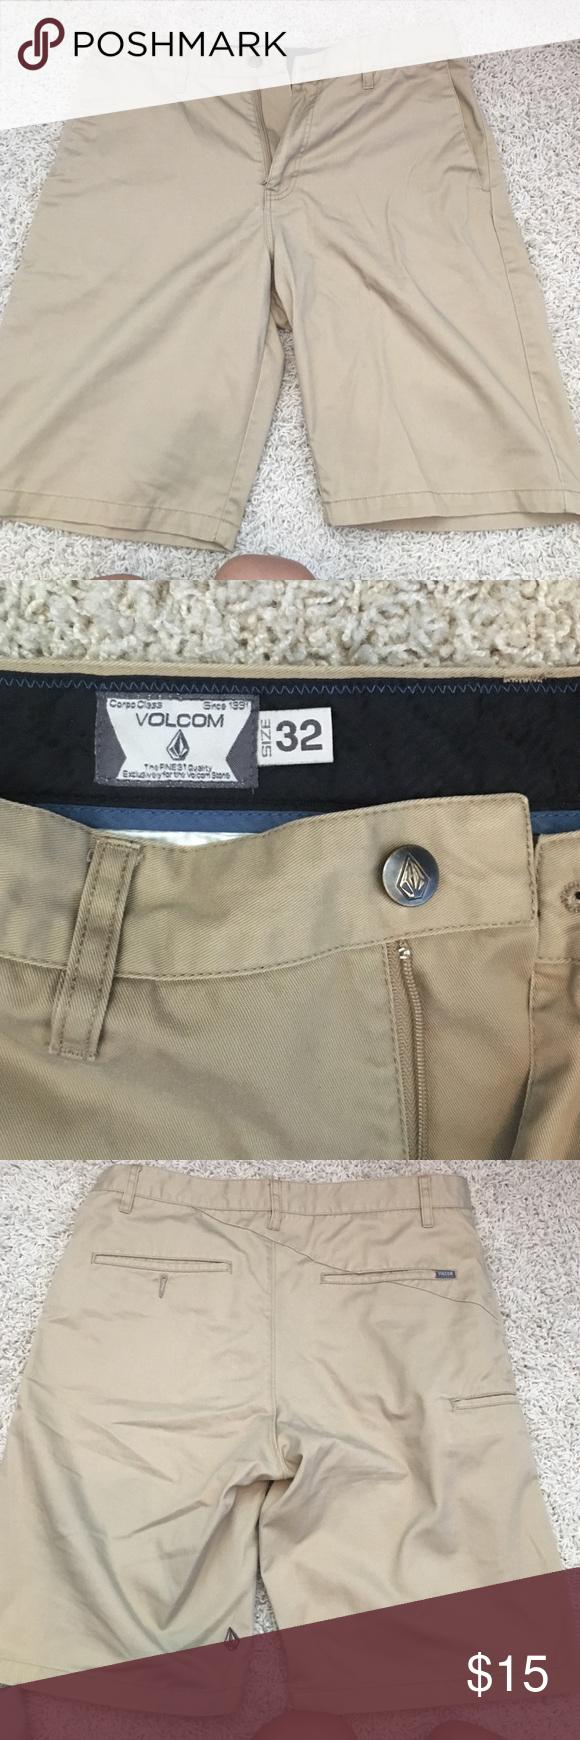 Men's khaki shorts Perfect condition! Volcom Shorts Flat Front